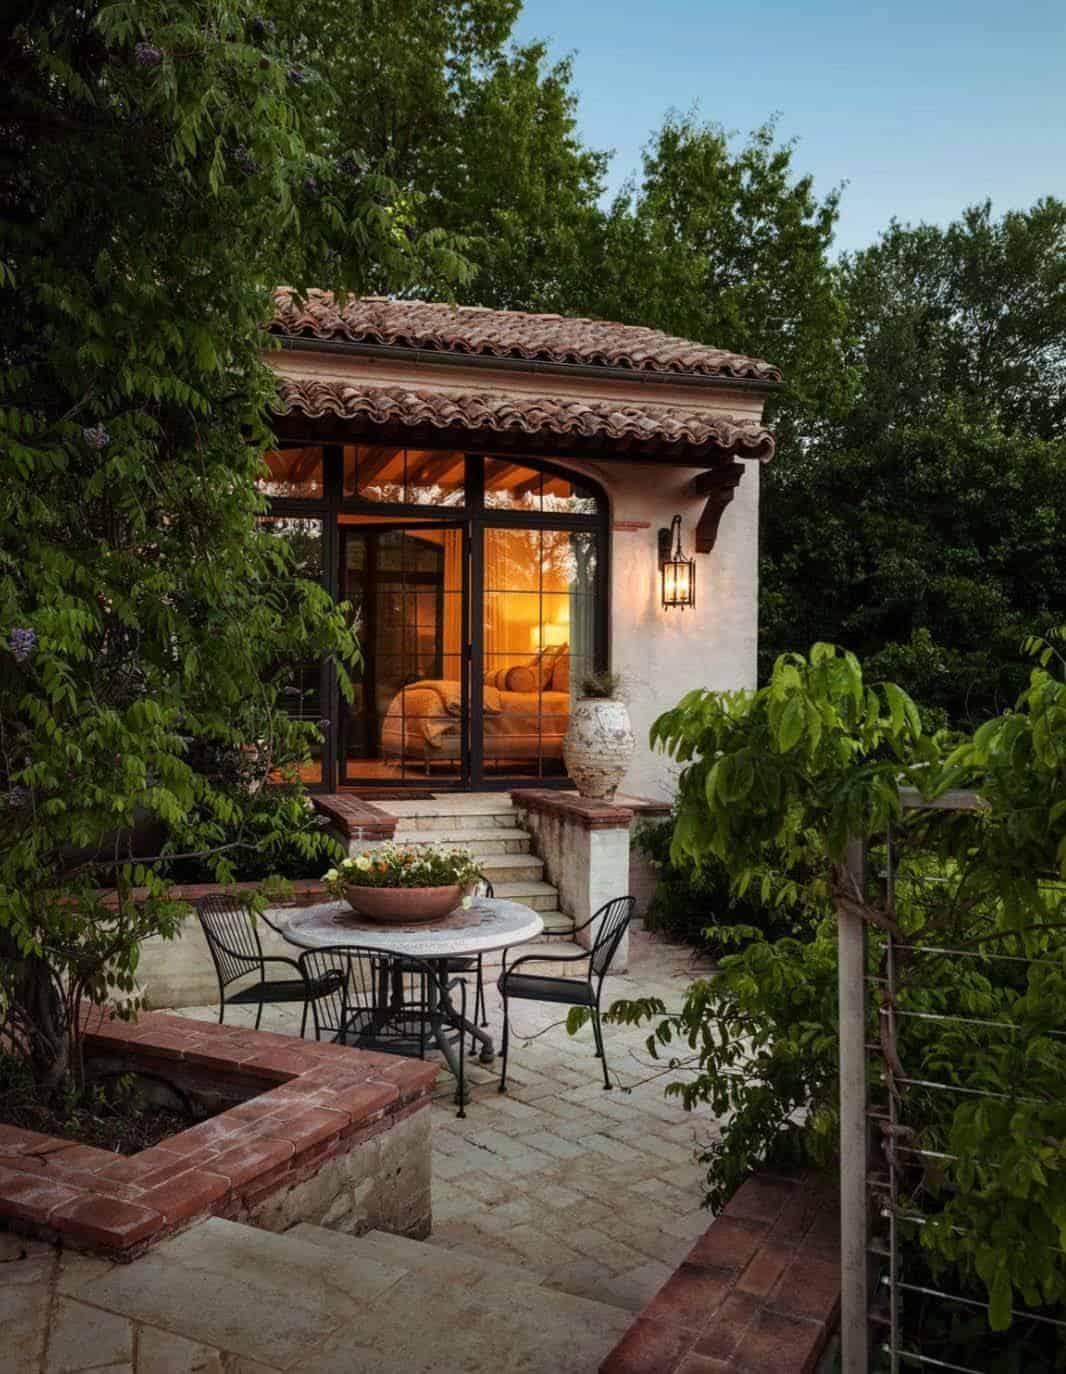 Mediterranean Style Residence-Stocker Hoesterey Montenegro-26-1 Kindesign